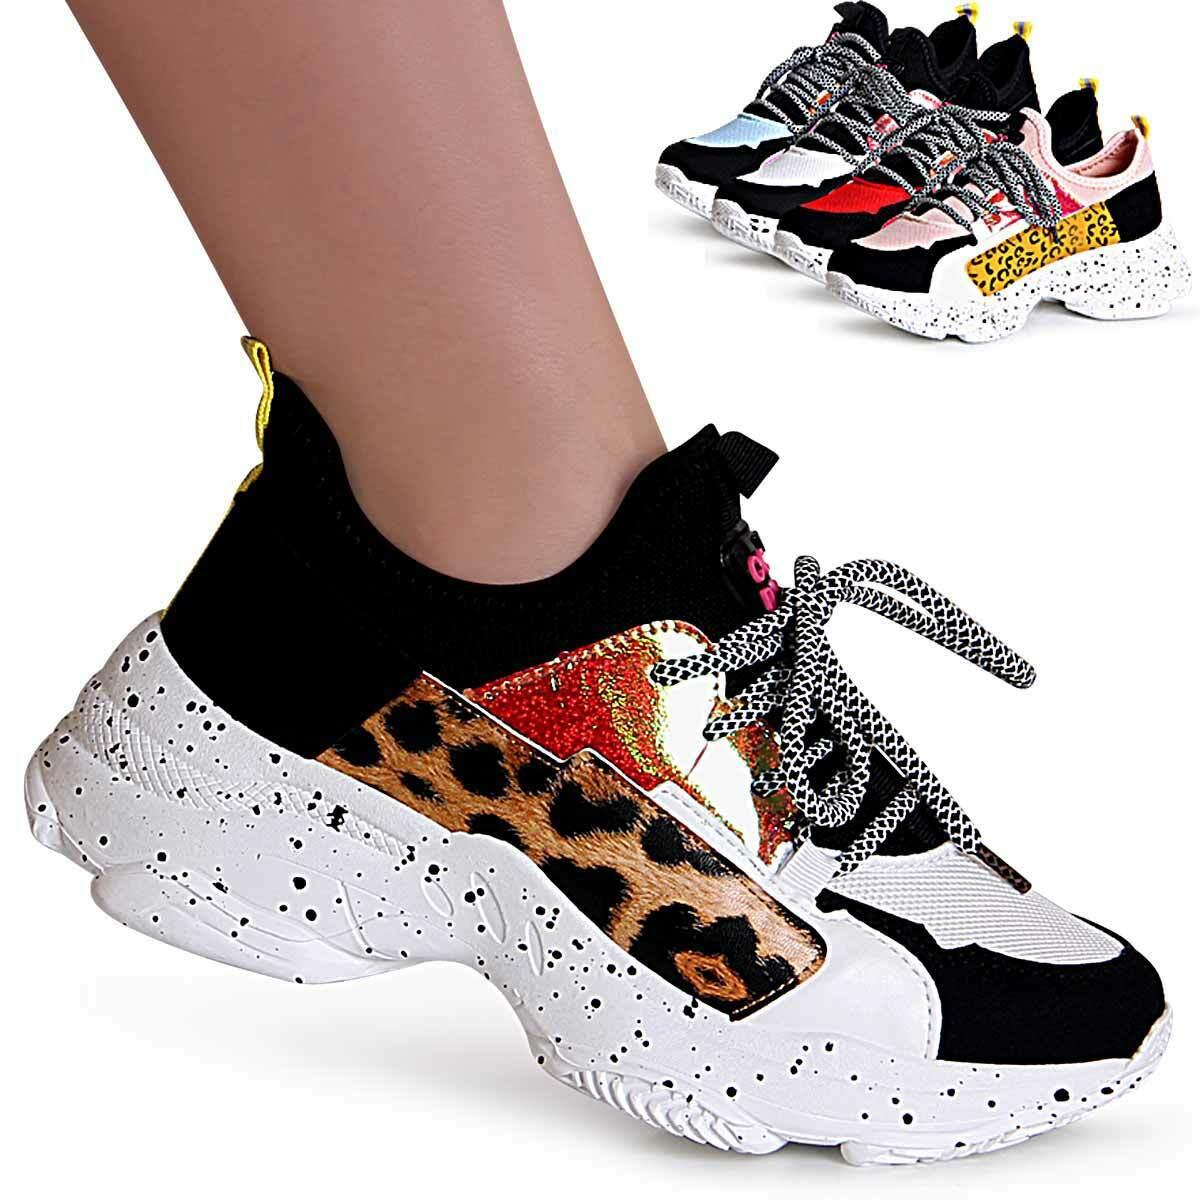 Damenschuhe Plateau Sneaker Keilabsatz Chunky Turnschuhe Halbschuhe Leo